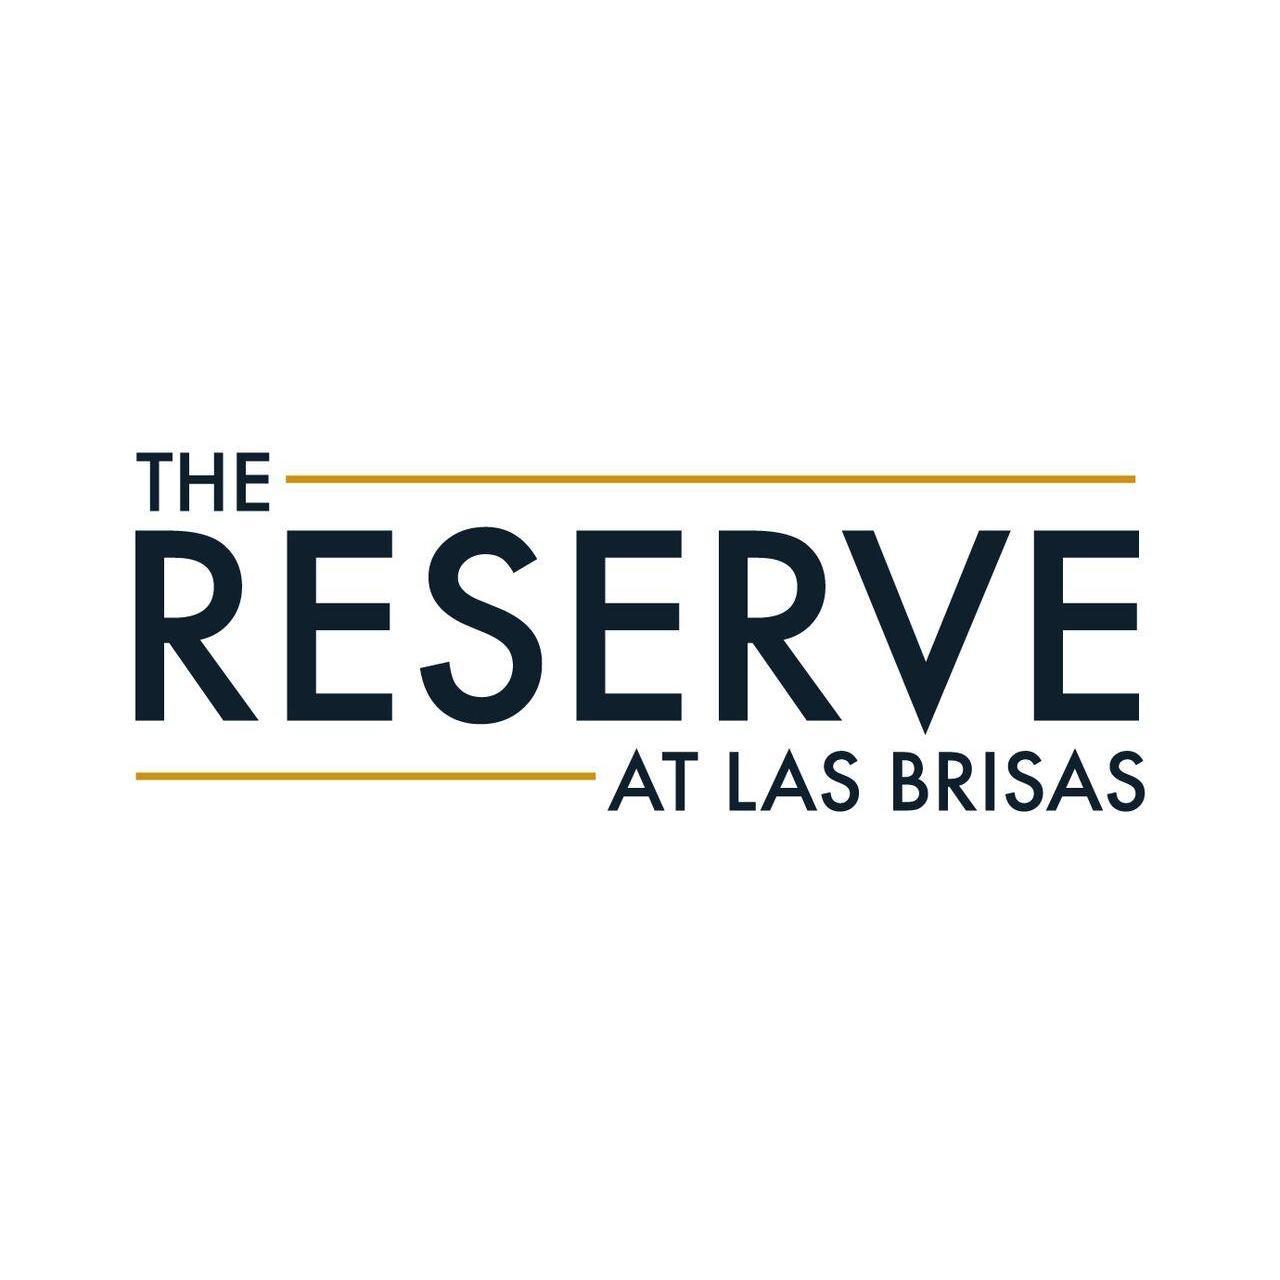 The Reserve at Las Brisas Apartments image 5